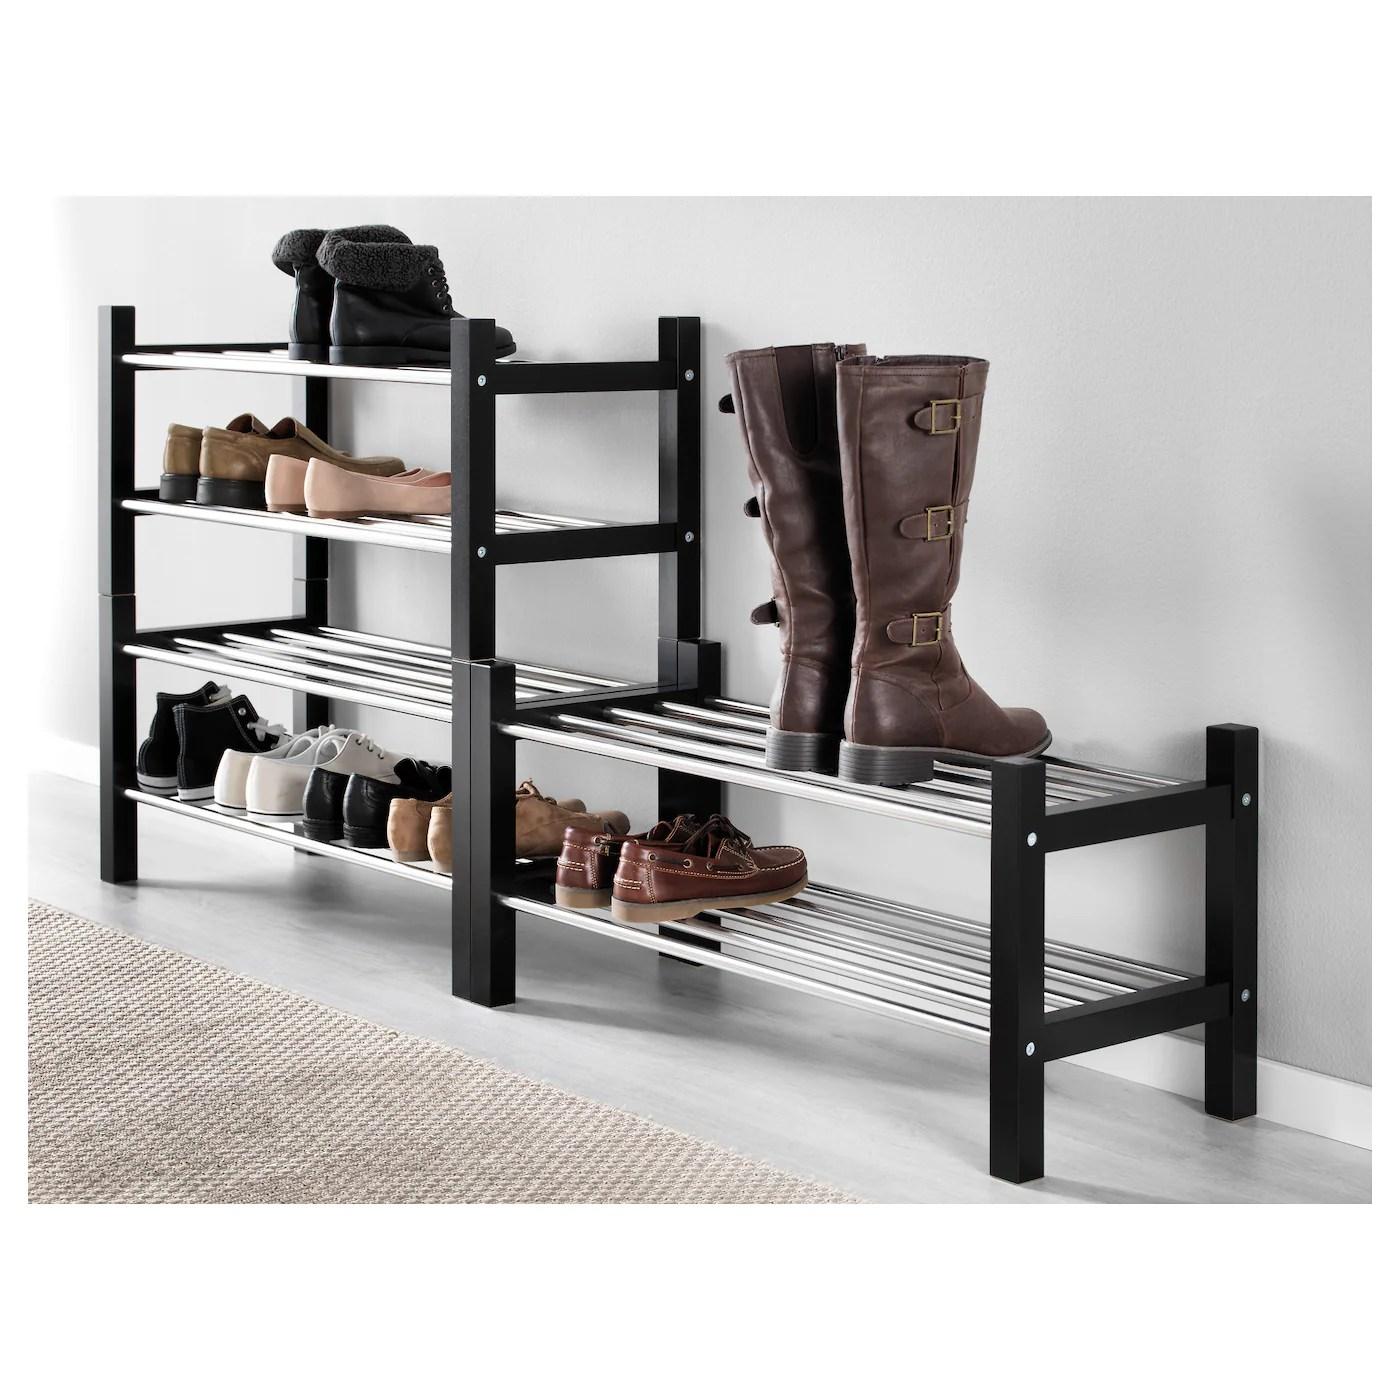 tjusig shoe rack black 31 1 8x12 5 8x14 5 8